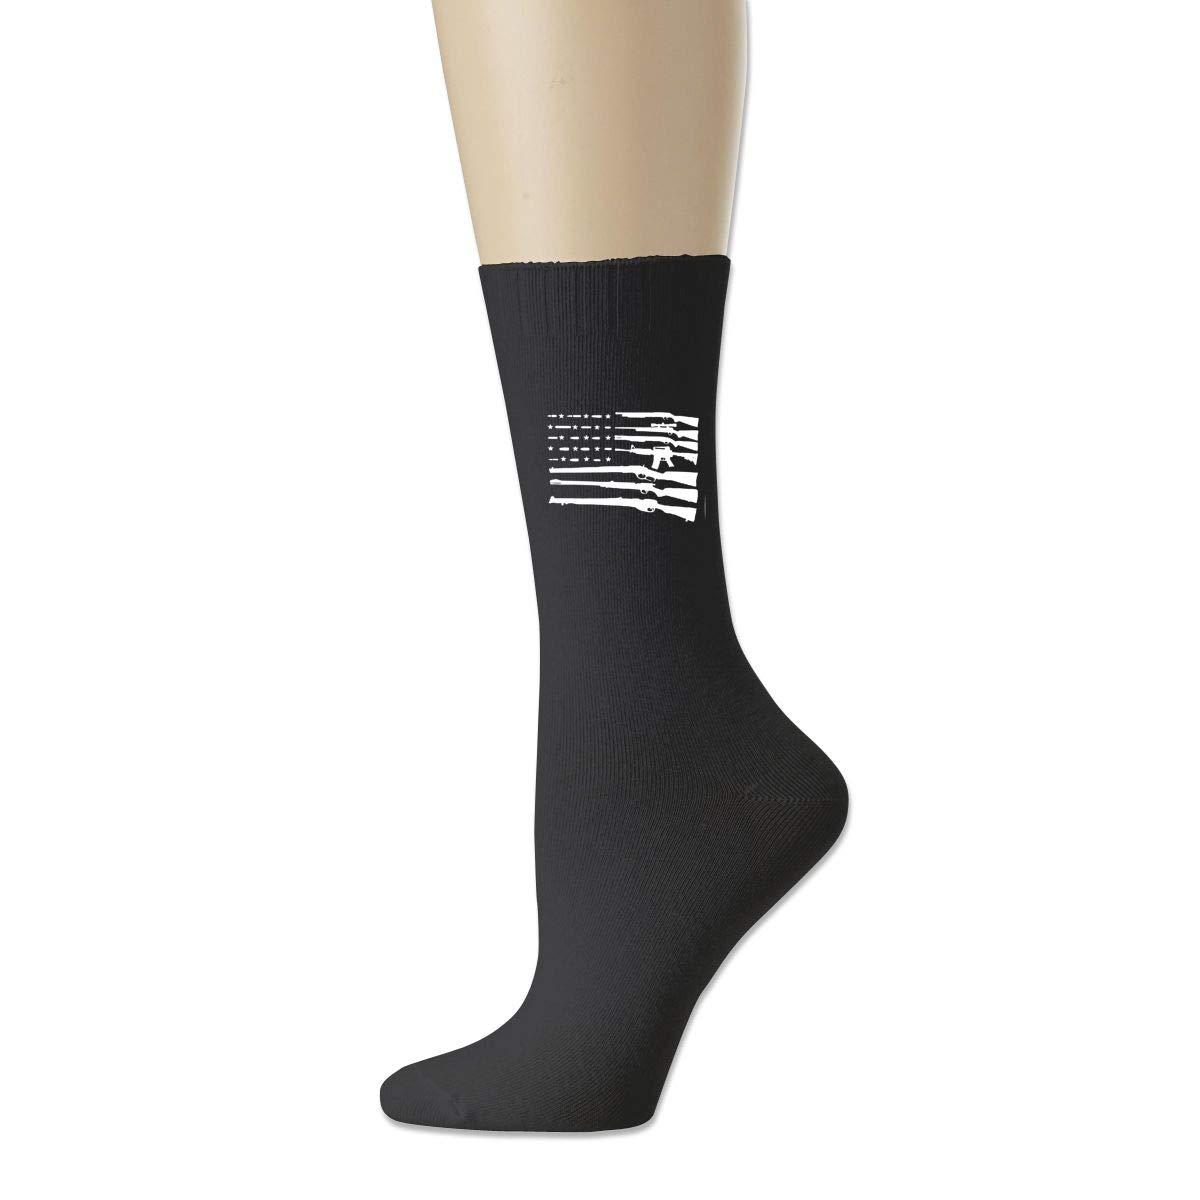 Guns 2nd Amendment Mens Pack Crew Socks Tube Stockings Athletic Socks